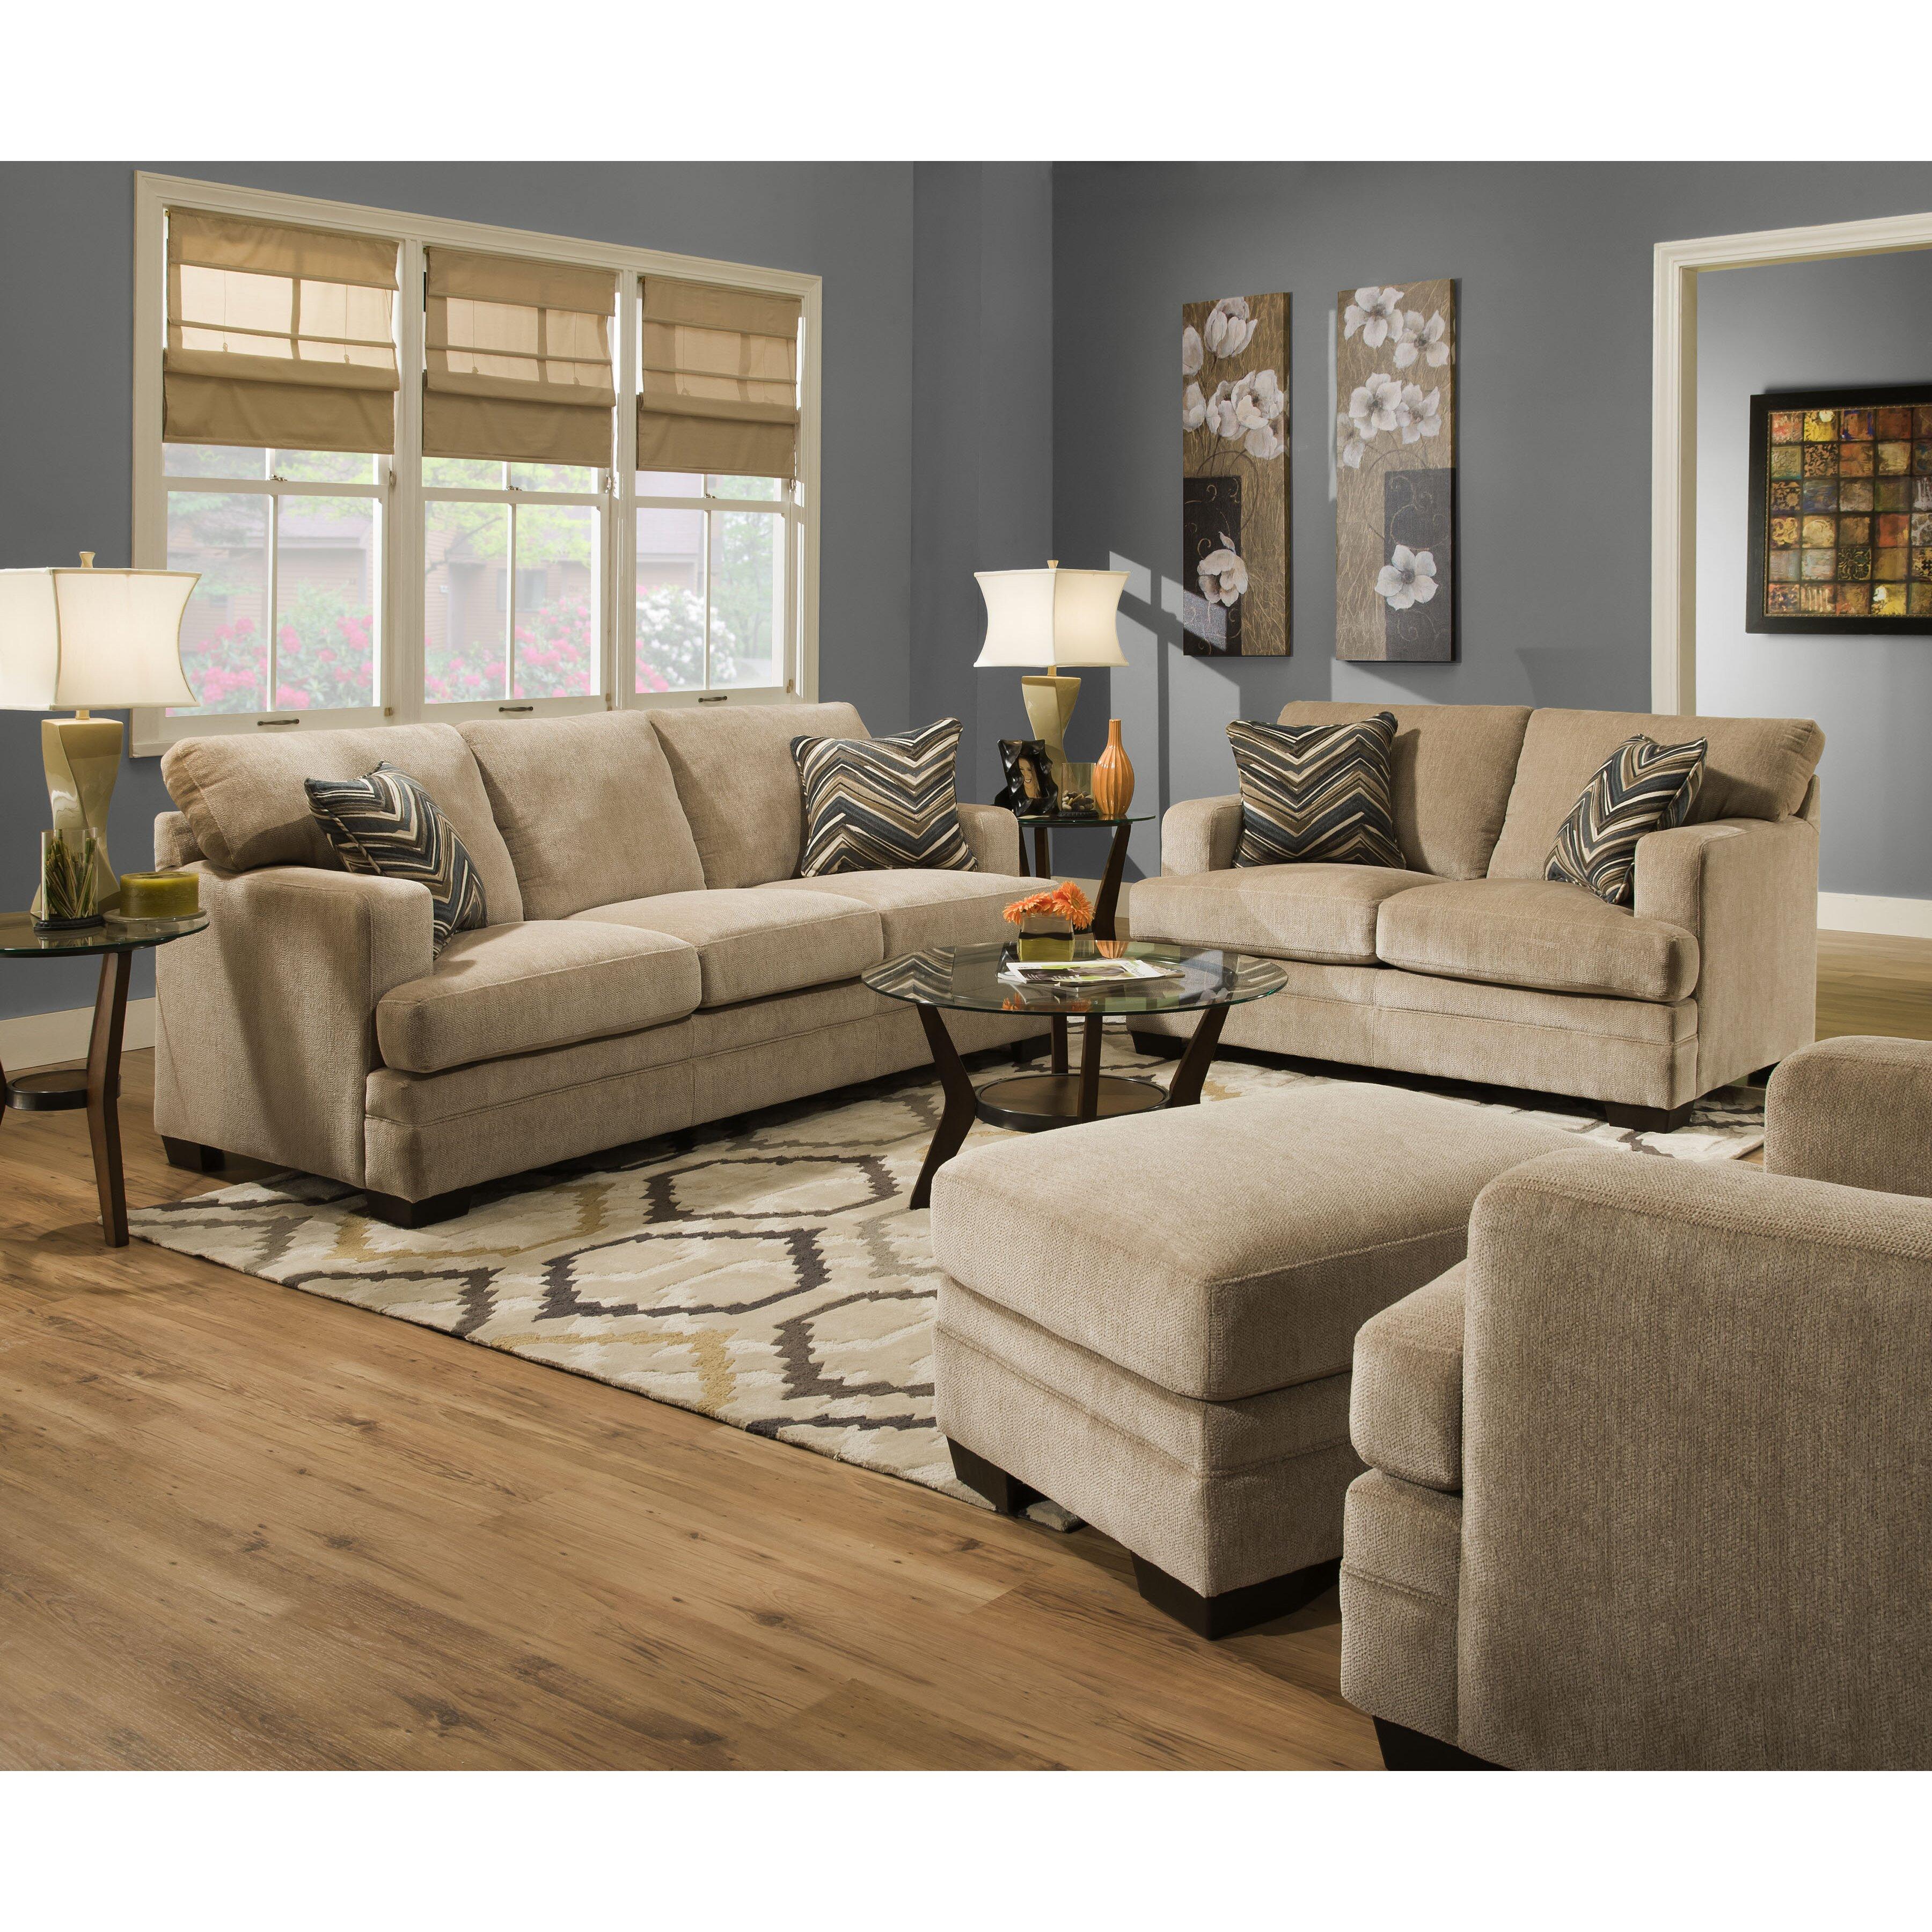 Rana Furniture Reviews